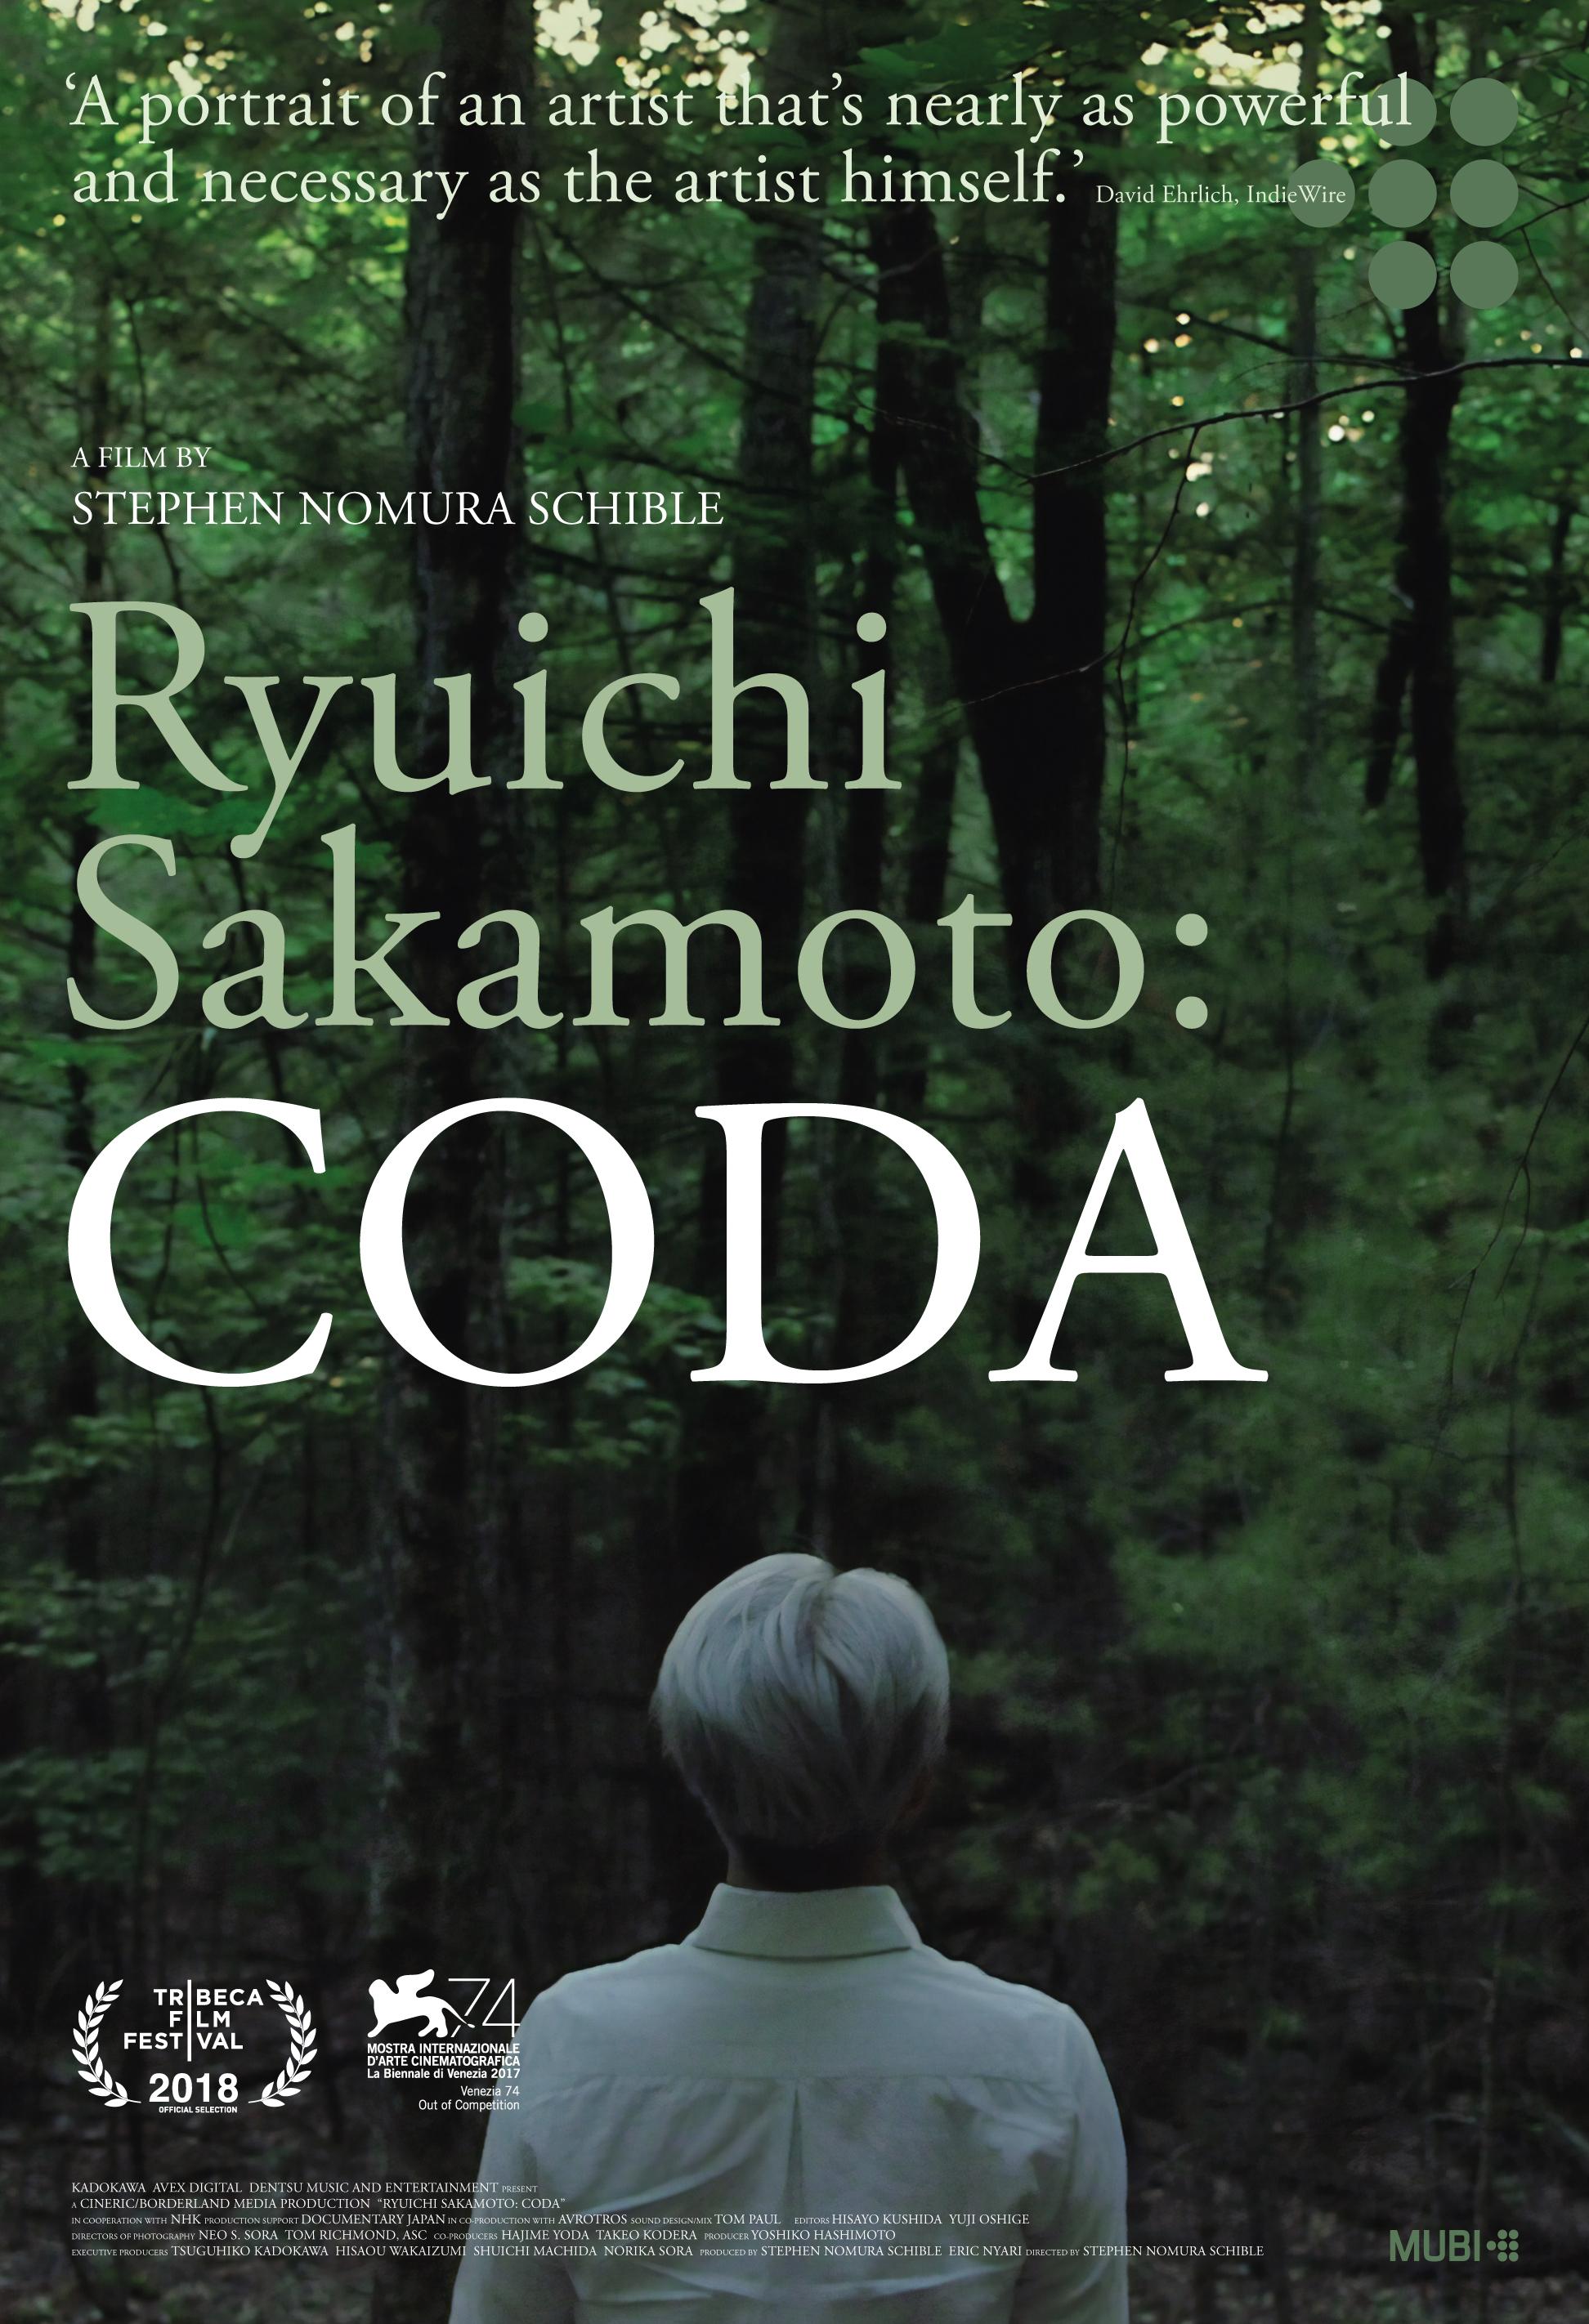 coda_poster.jpg